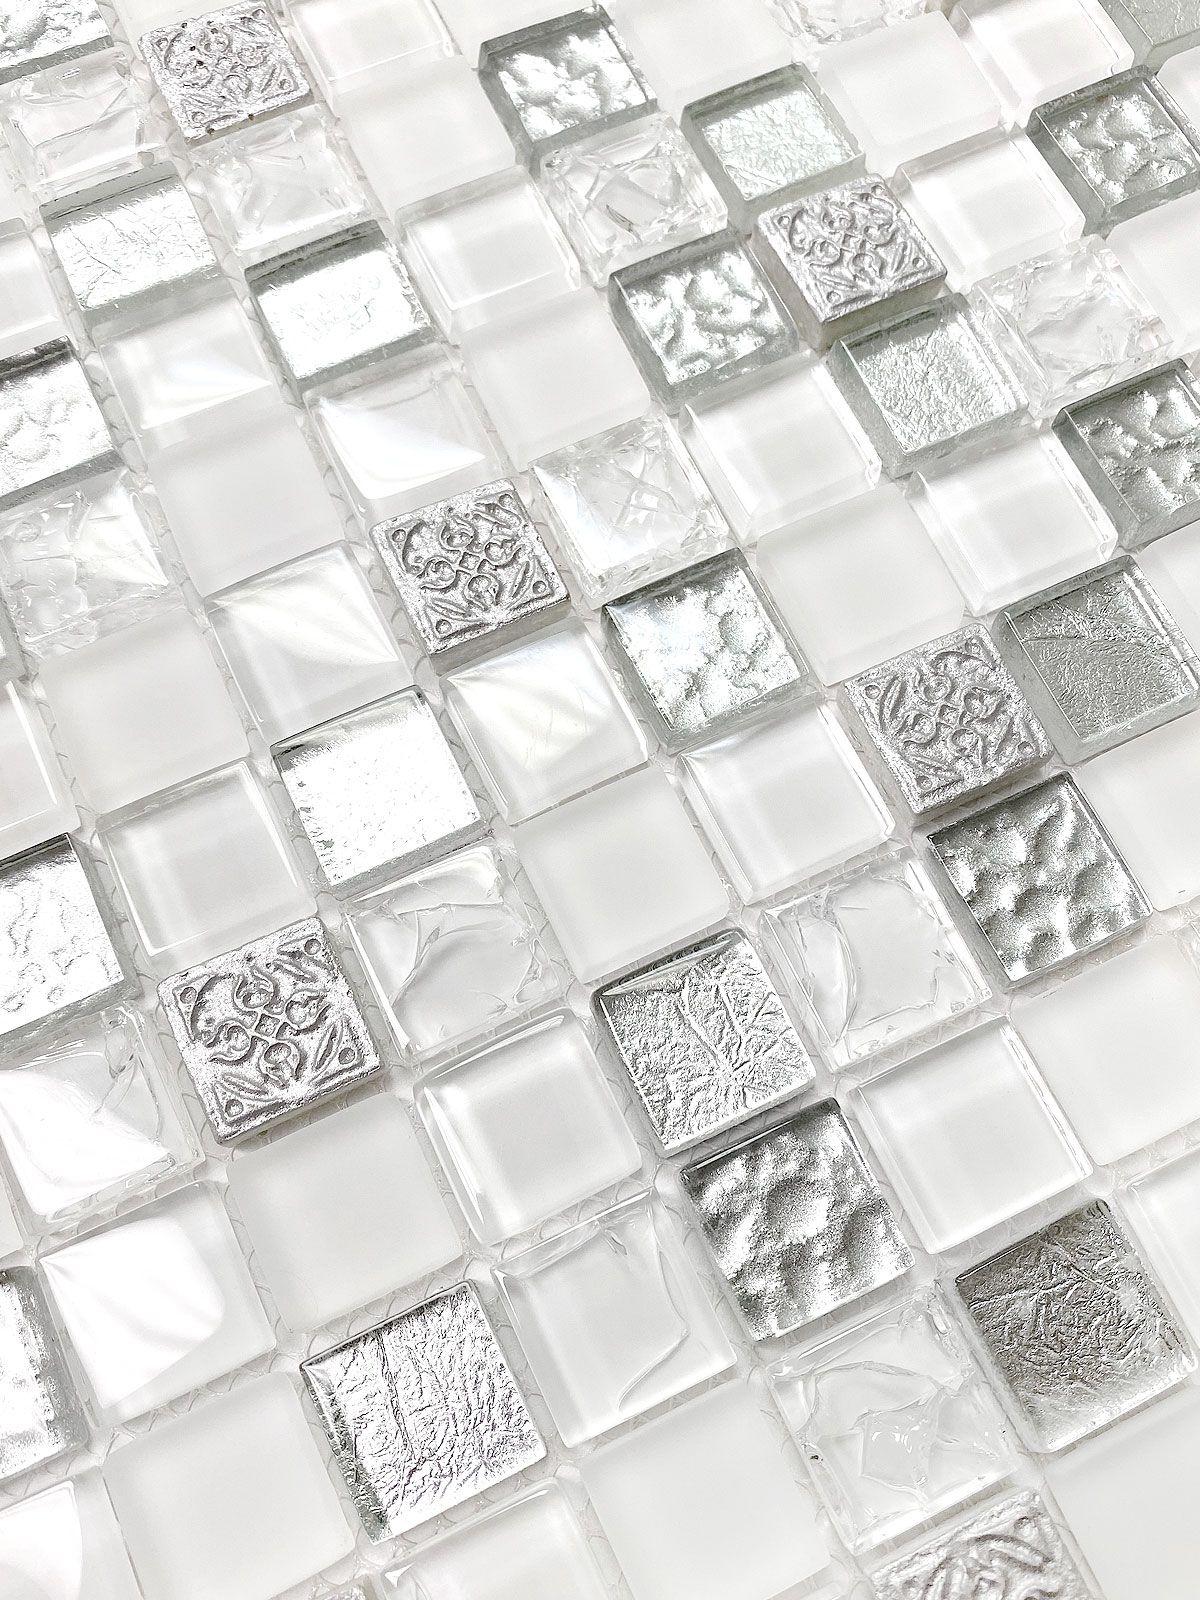 White Silver Color Elegant Glass Backsplash Tile Backsplash Com Tile Backsplash Kitchen Backsplash Glass Backsplash